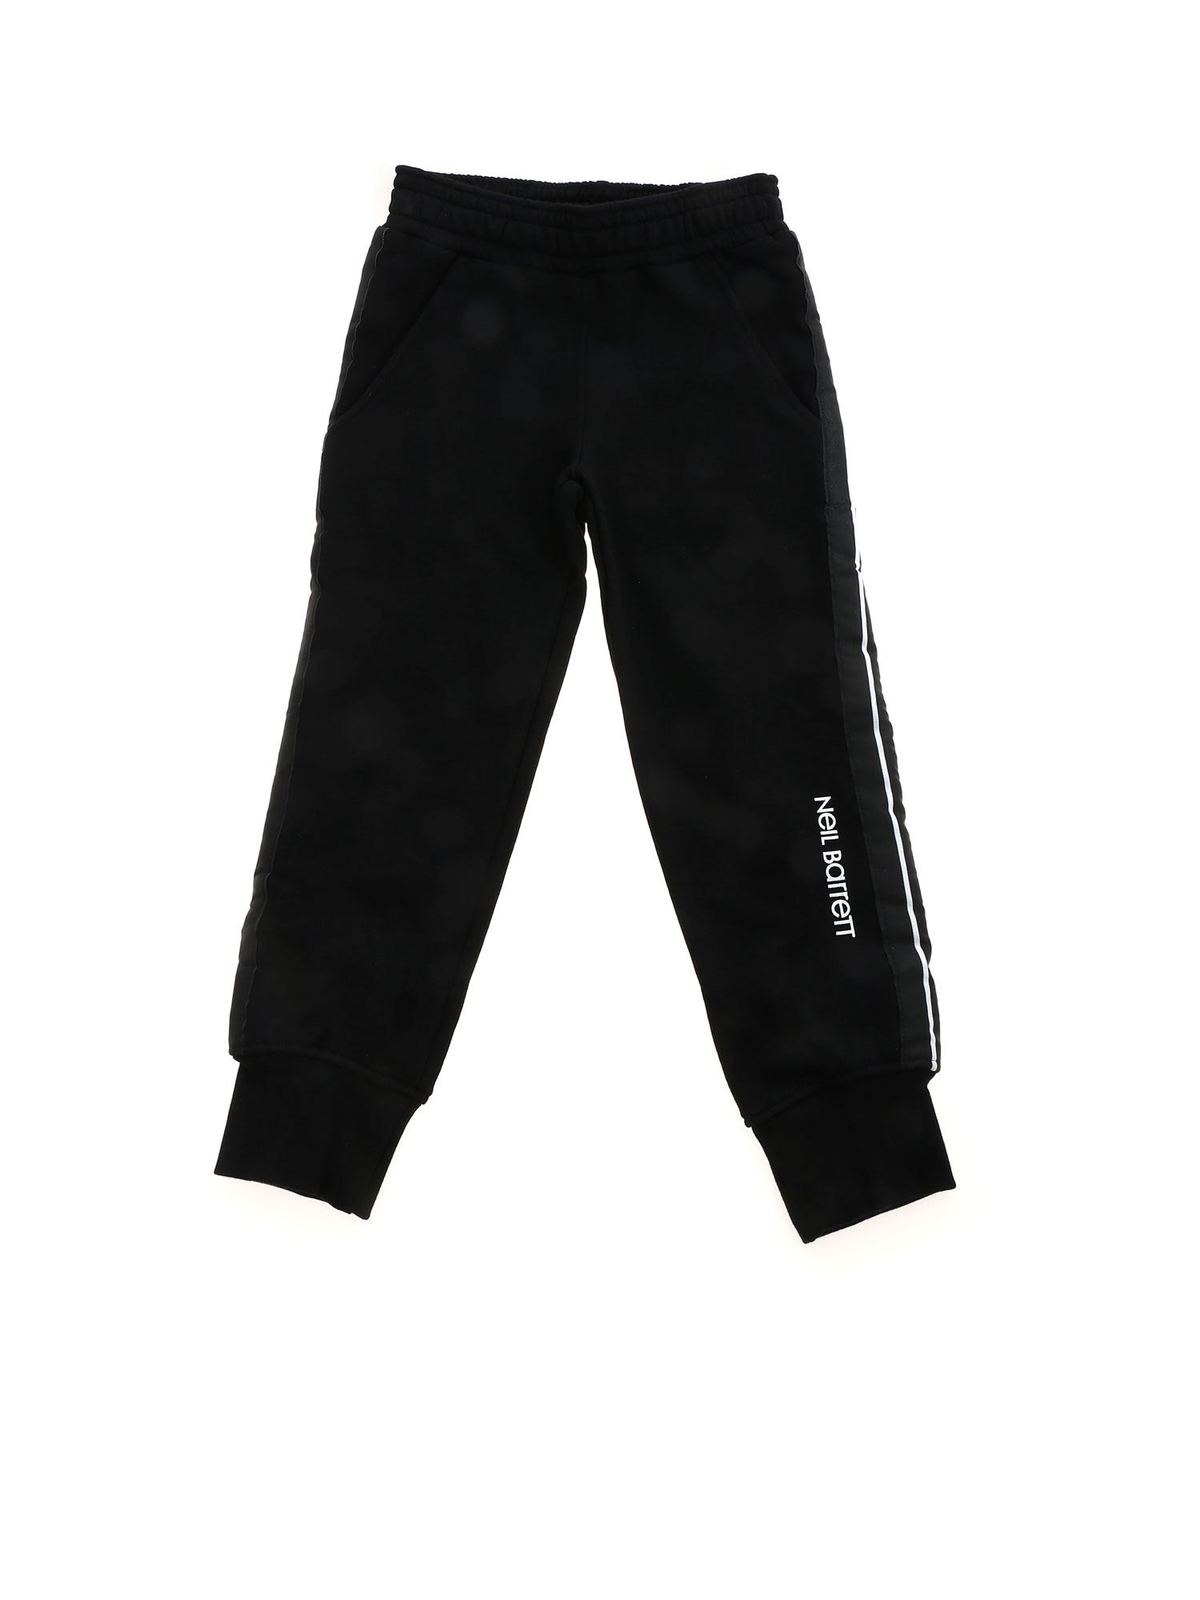 Neil Barrett STRIPED BAND PANTS IN BLACK